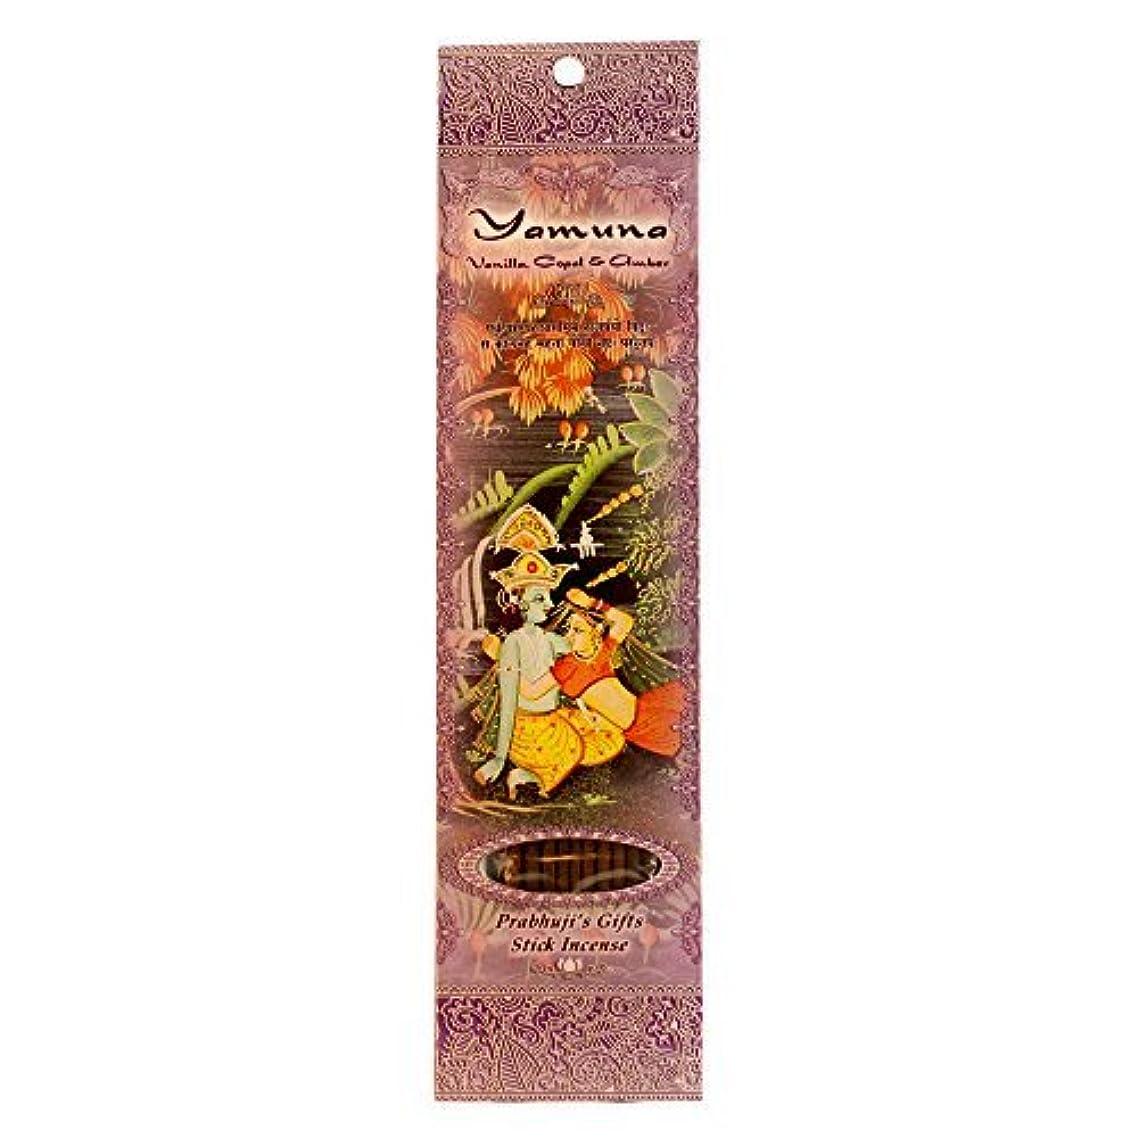 Incense Sticks Yamuna - Vanilla Copal and Amber [並行輸入品]